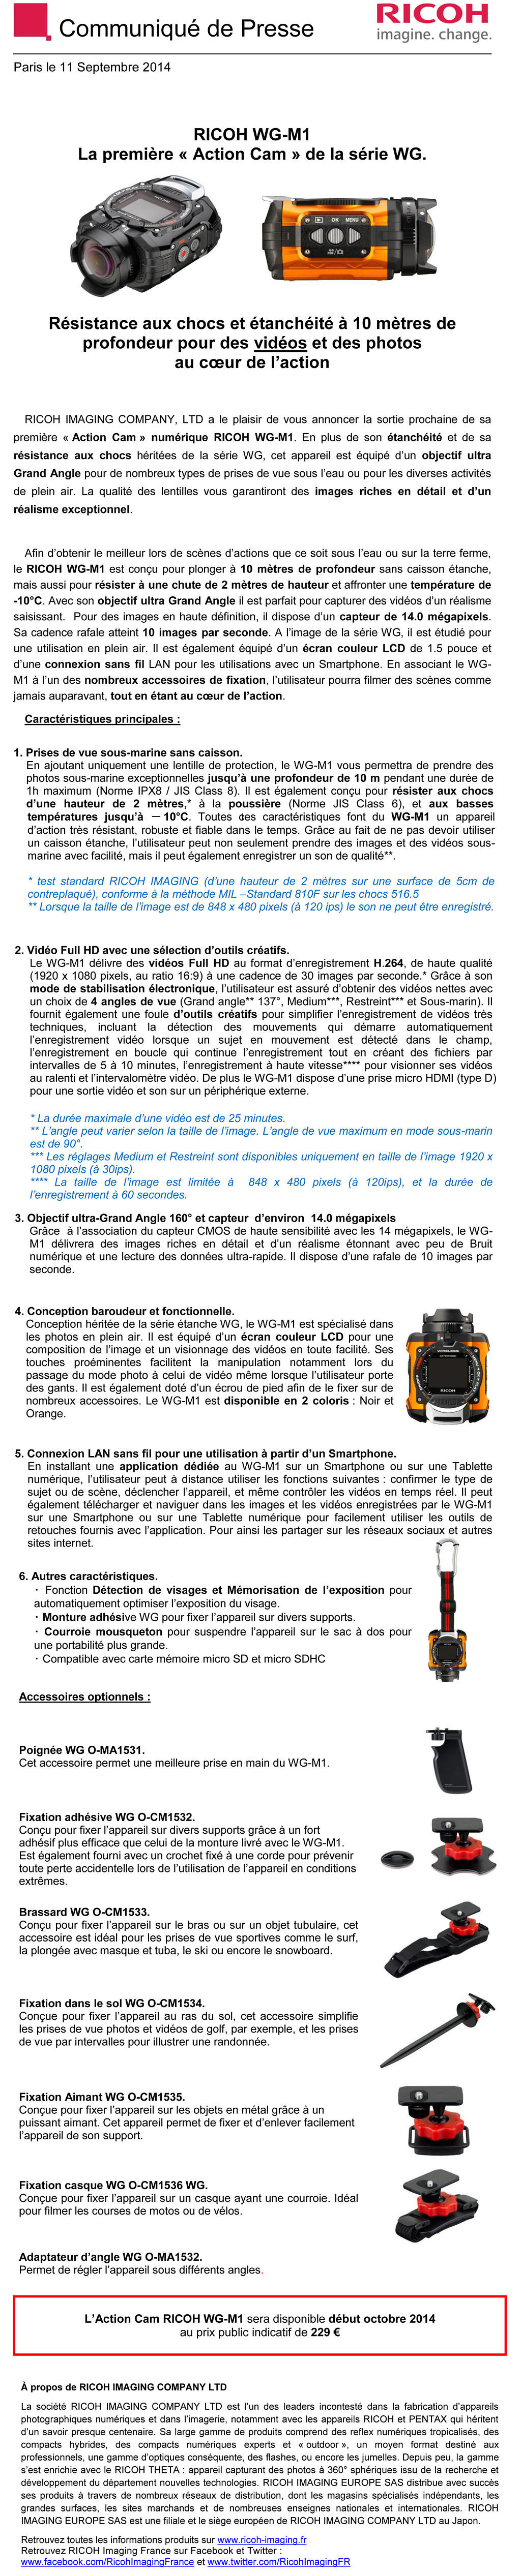 PENTAX RICOH IMAGING - CP 11/09/2014 -  RICOH WG-M1 GgiRQV